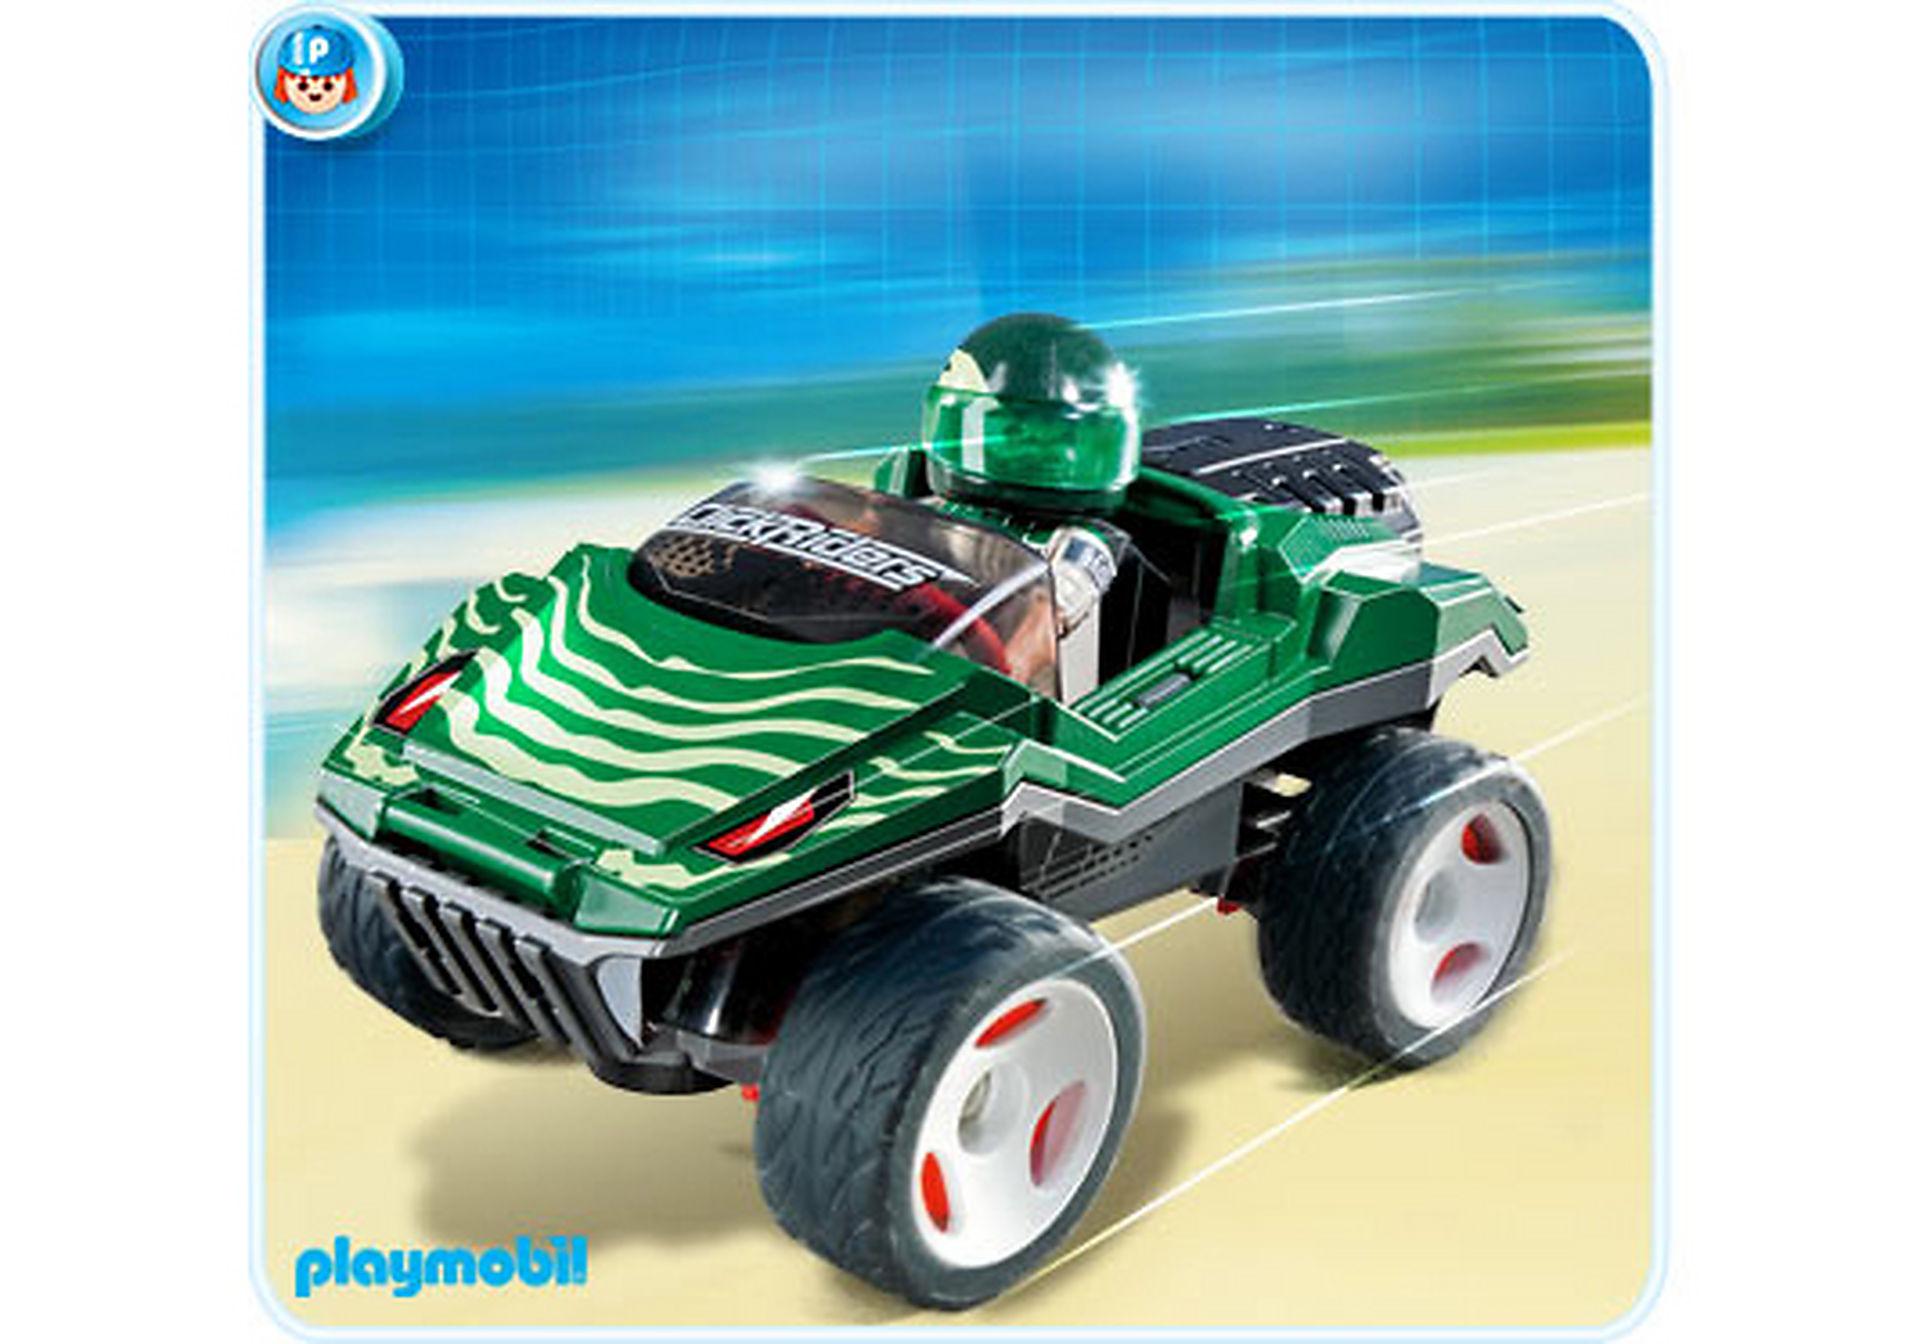 5160-A Click & Go Snake Racer zoom image1